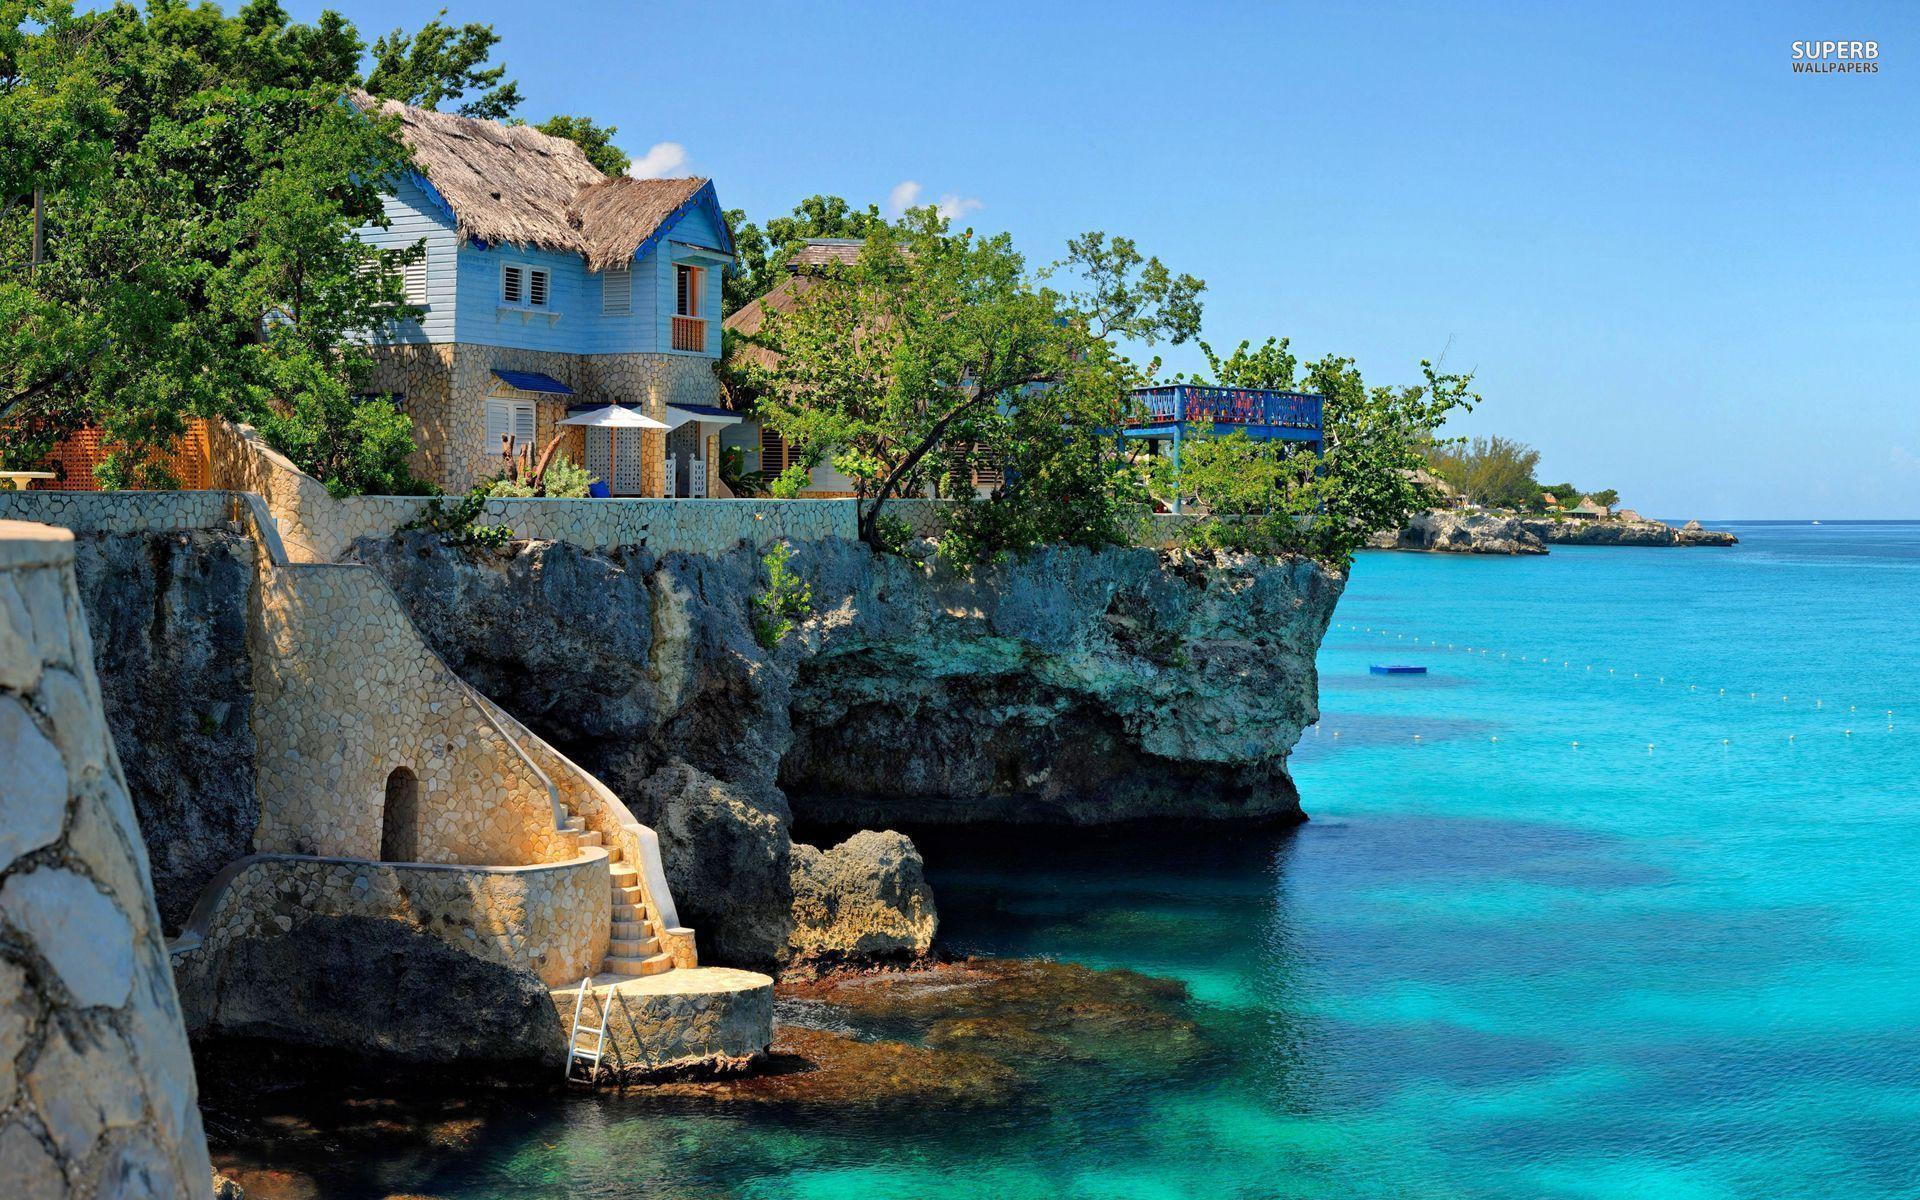 jamaica beach wallpapers wallpaper cave